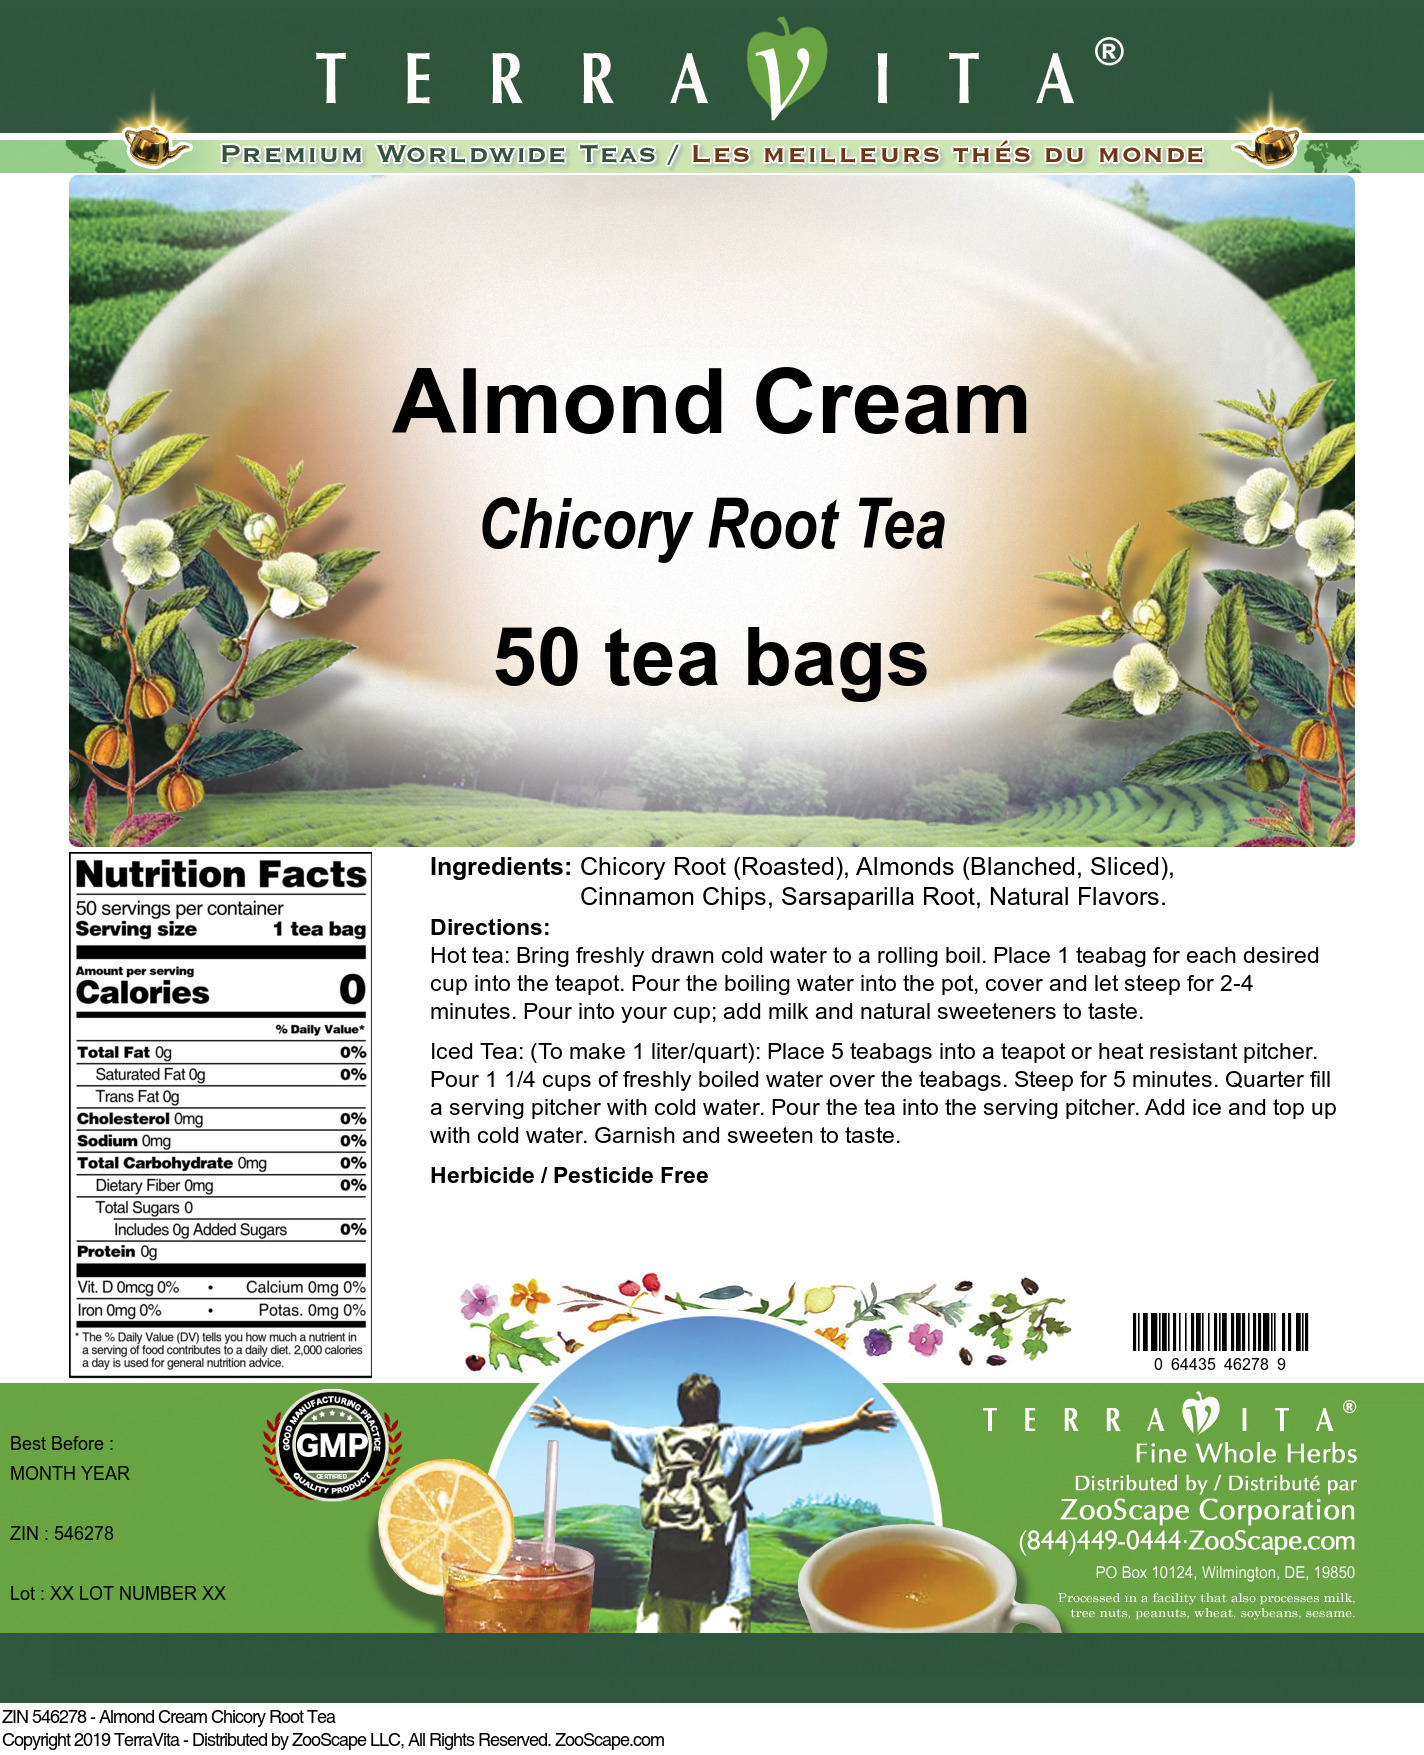 Almond Cream Chicory Root Tea